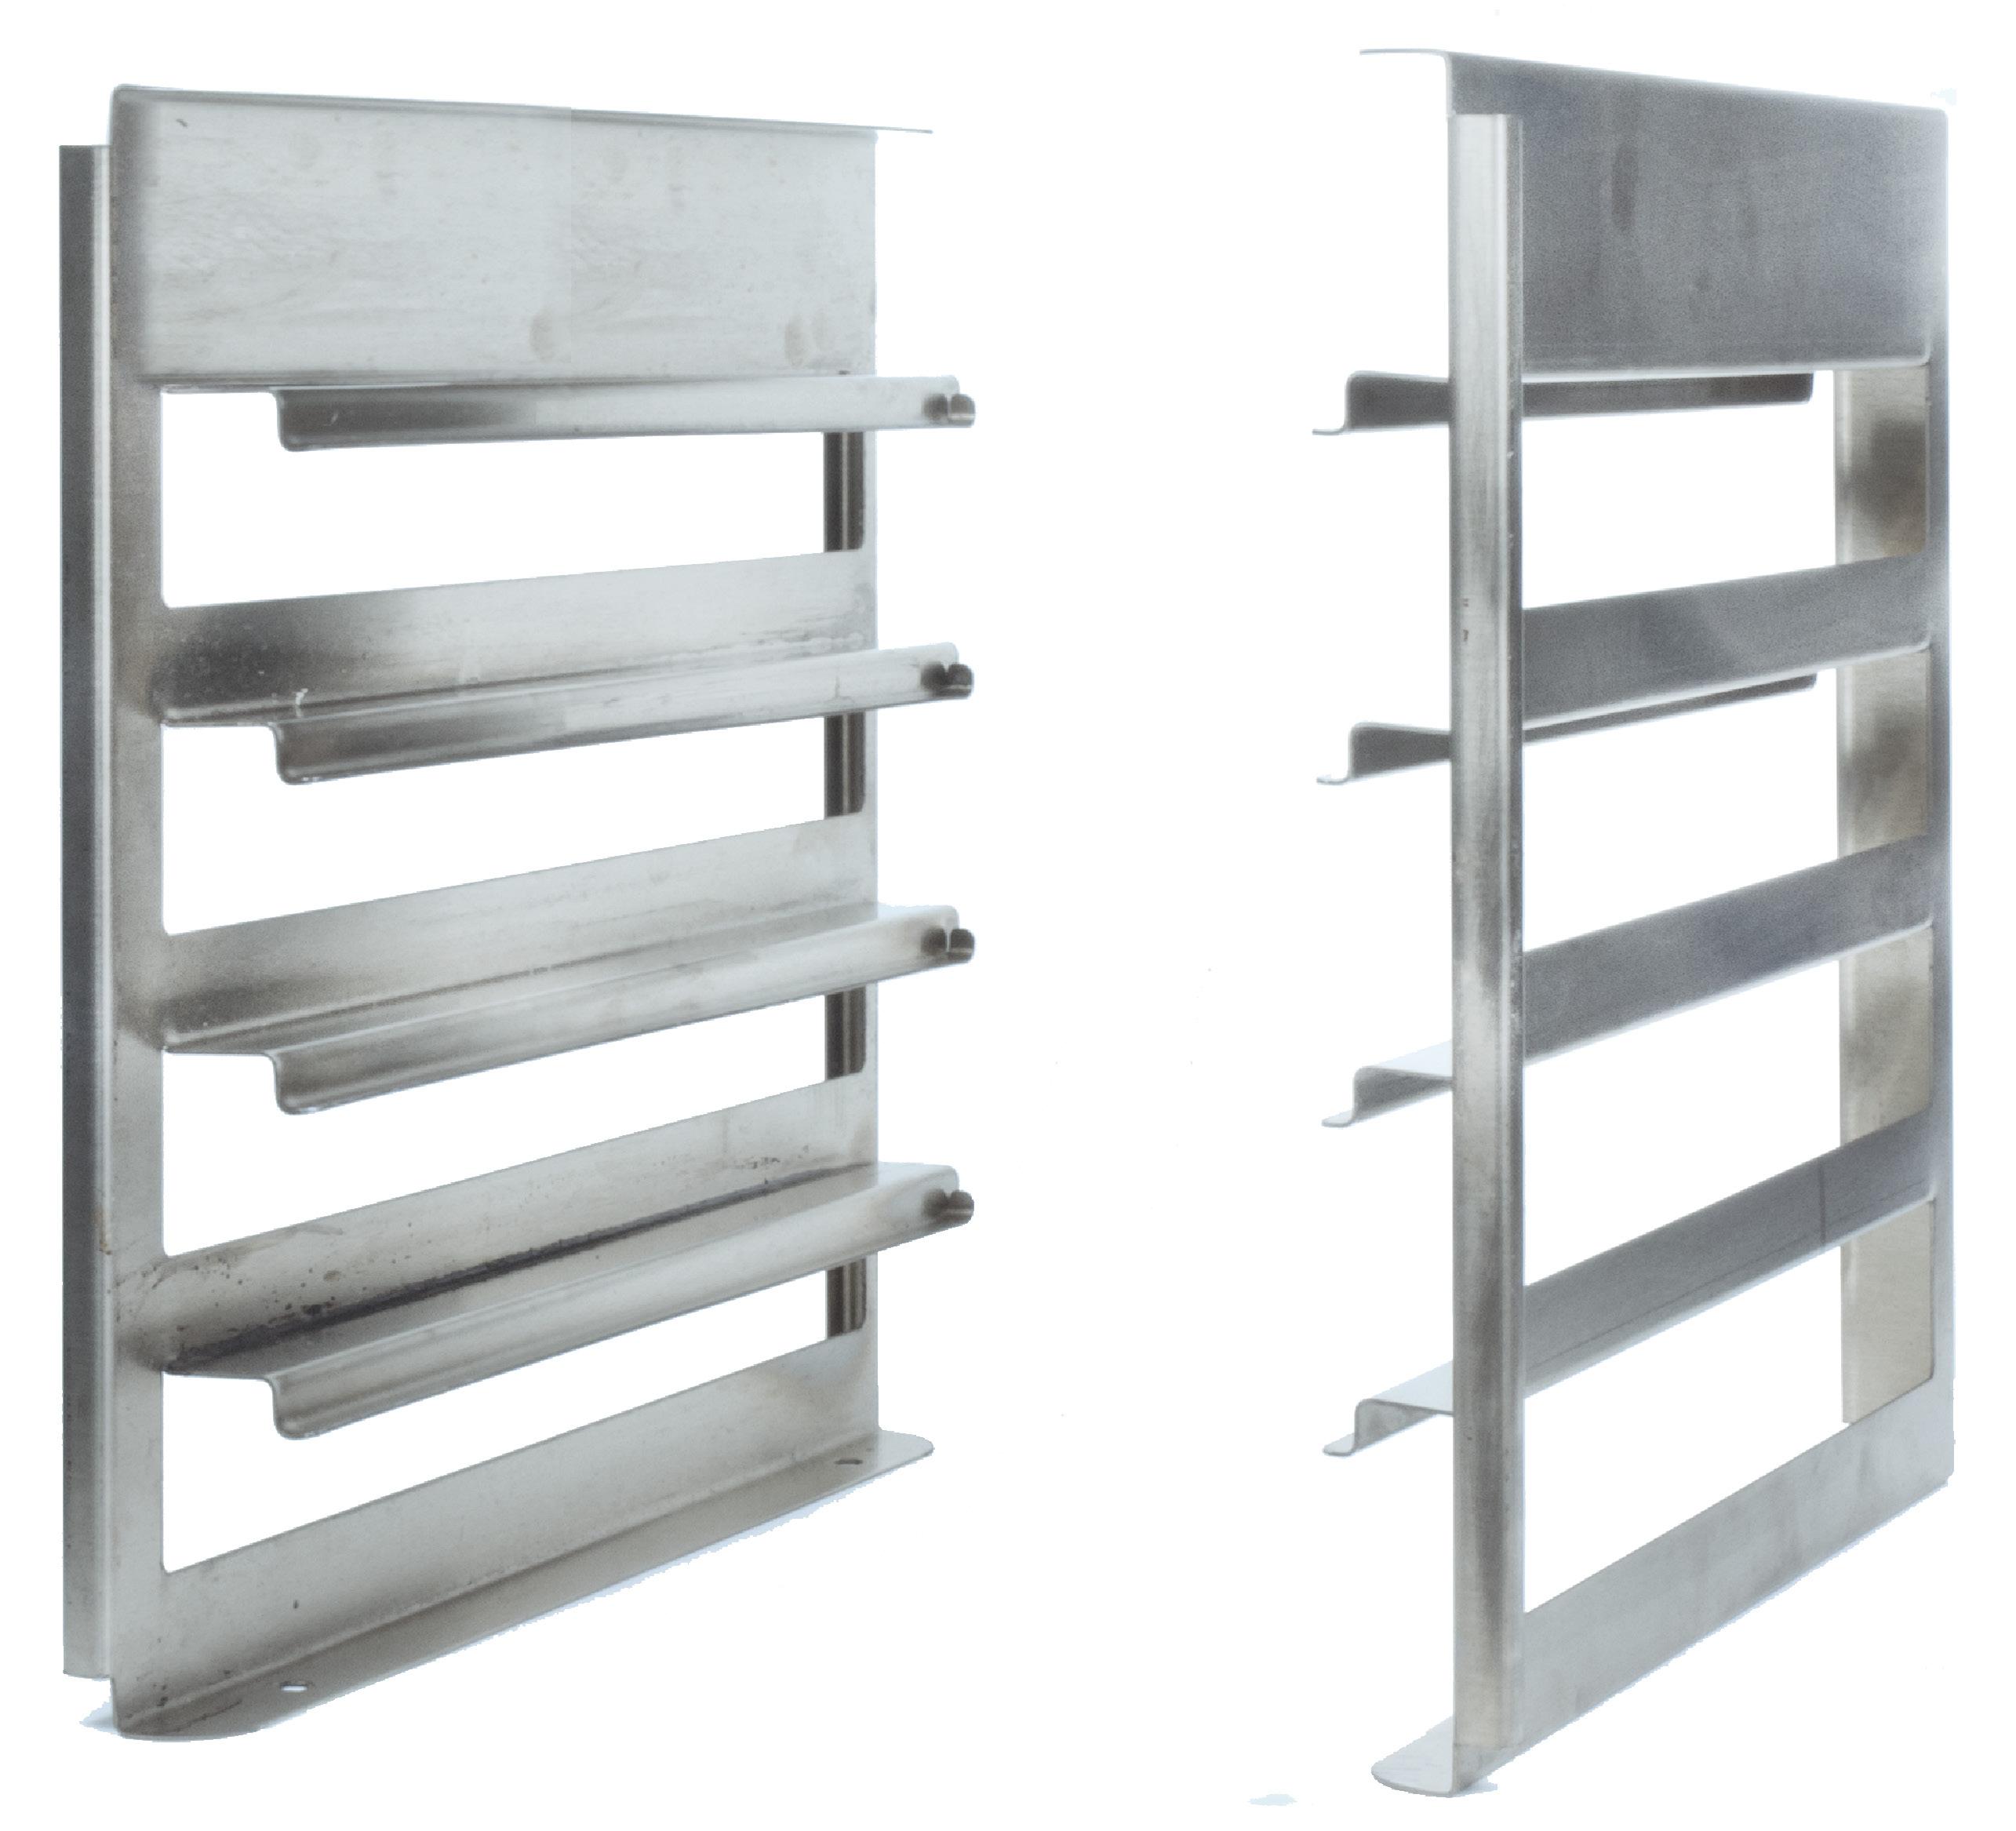 Eurast 40800202 Pastry rack (pair) 8 levels for 2 - 5 series ovens